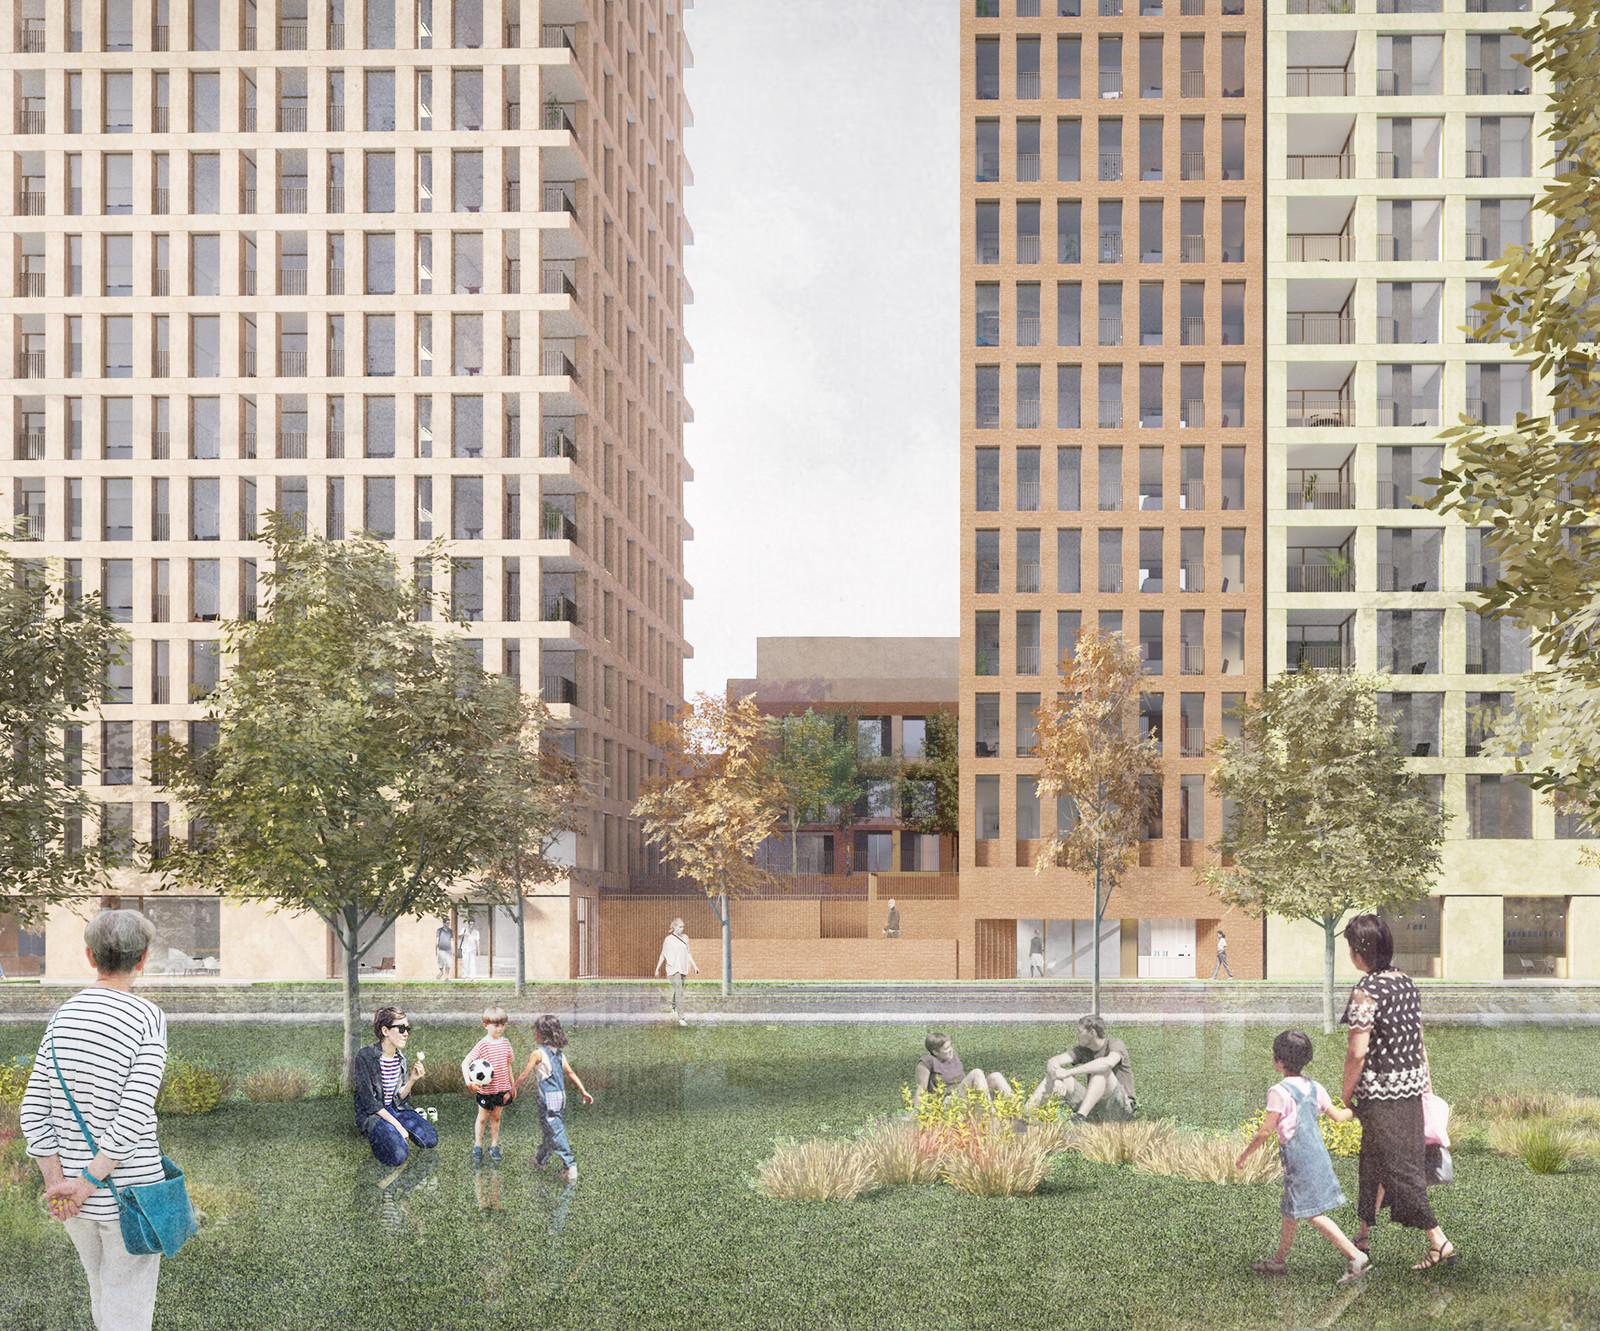 Hall McKnight Architect's design  for Plot 18.02 on Lower Brickside